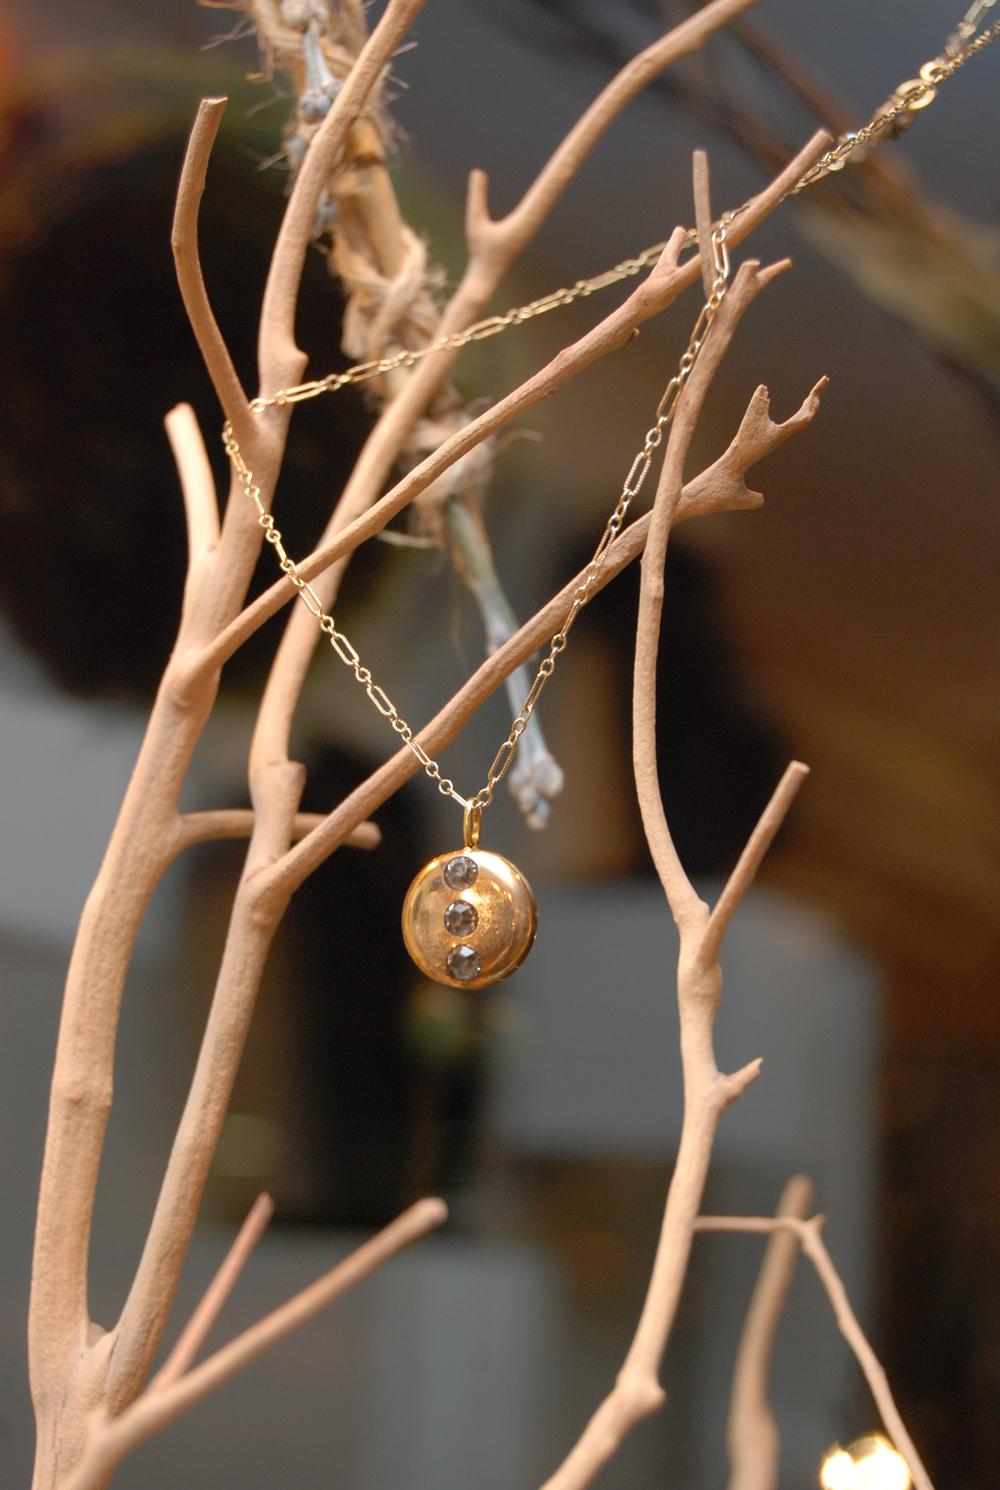 Round Gold Pendant Three Rhinestone GF Vintage Inspired Chain_04.JPG